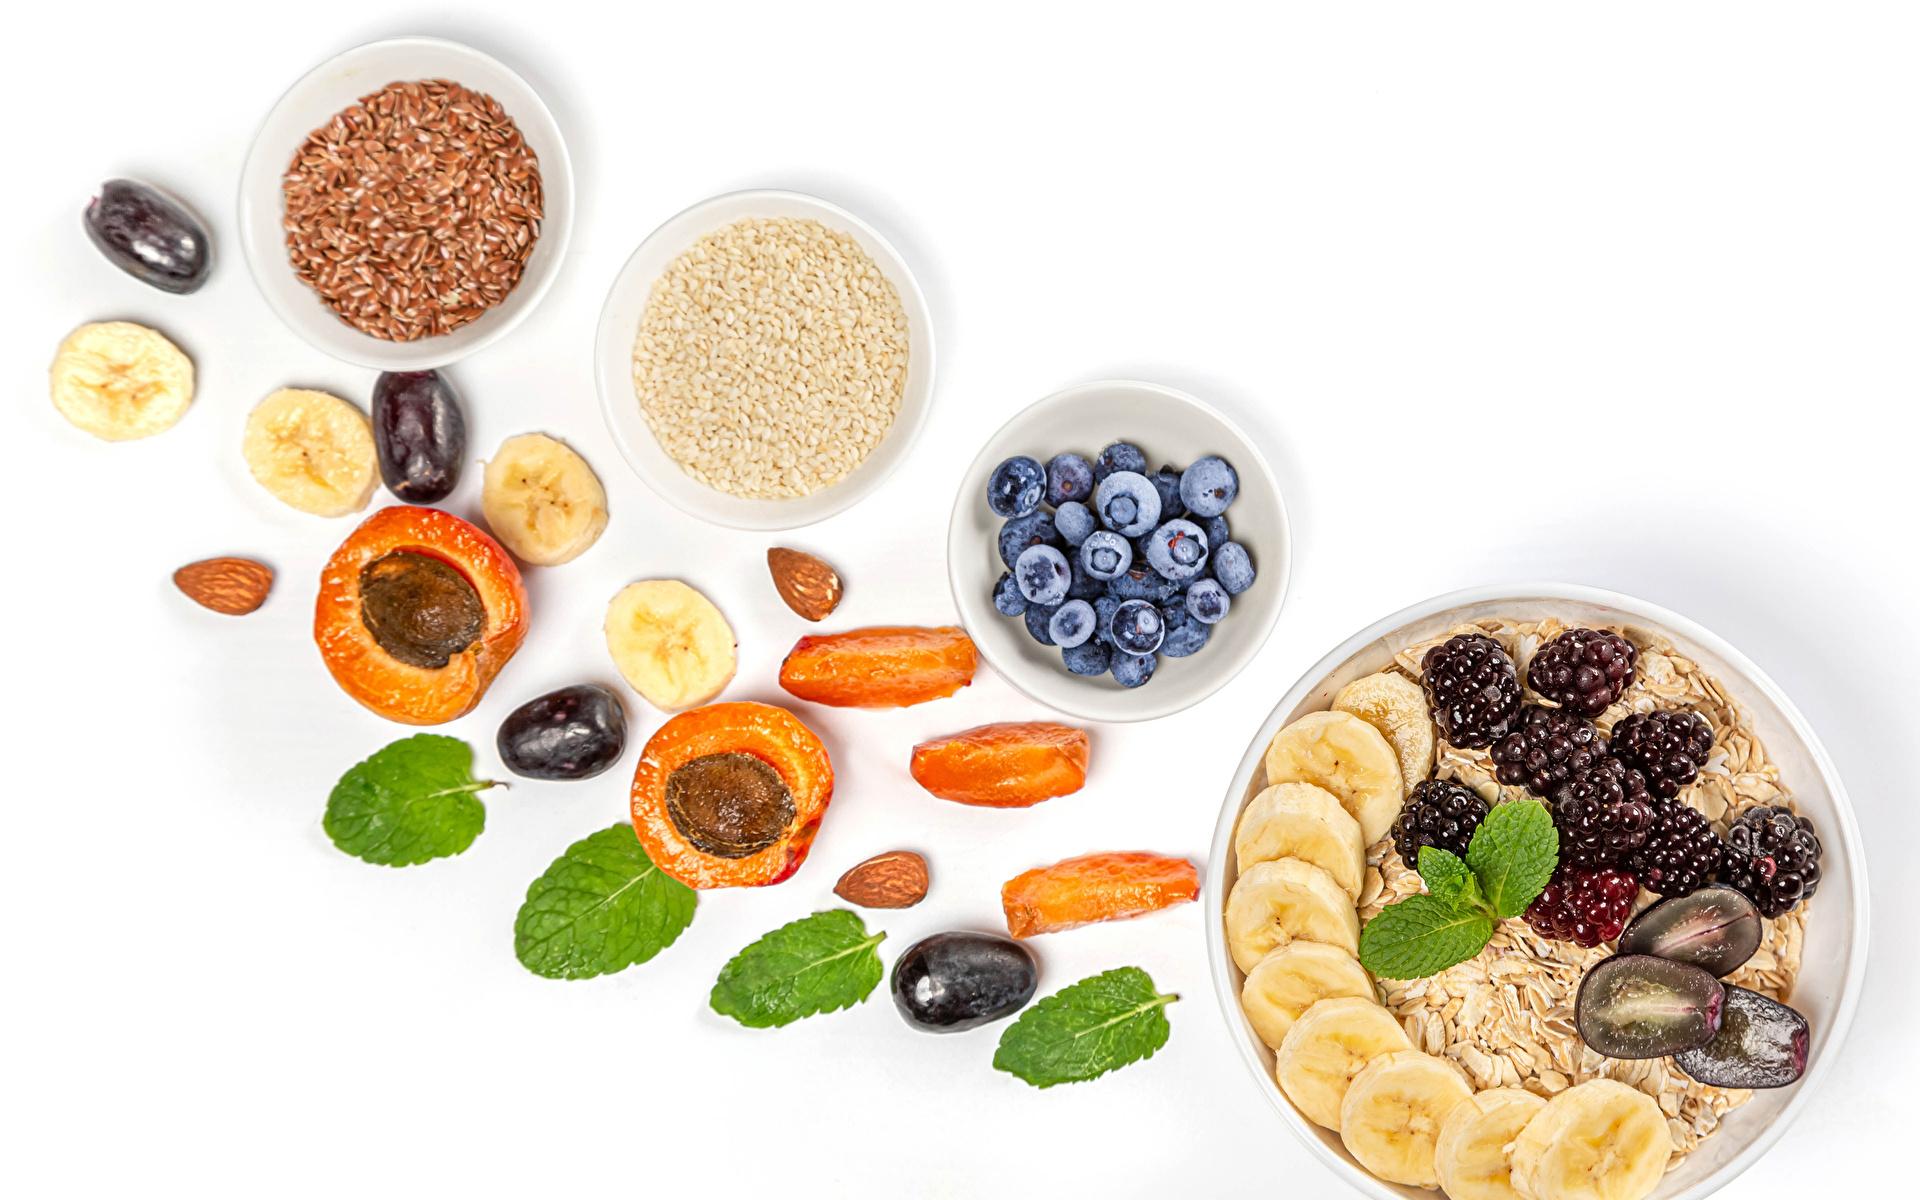 Desktop Wallpapers Oatmeal Apricot Plums Grain Blackberry Blueberries Food Fruit Muesli White background 1920x1200